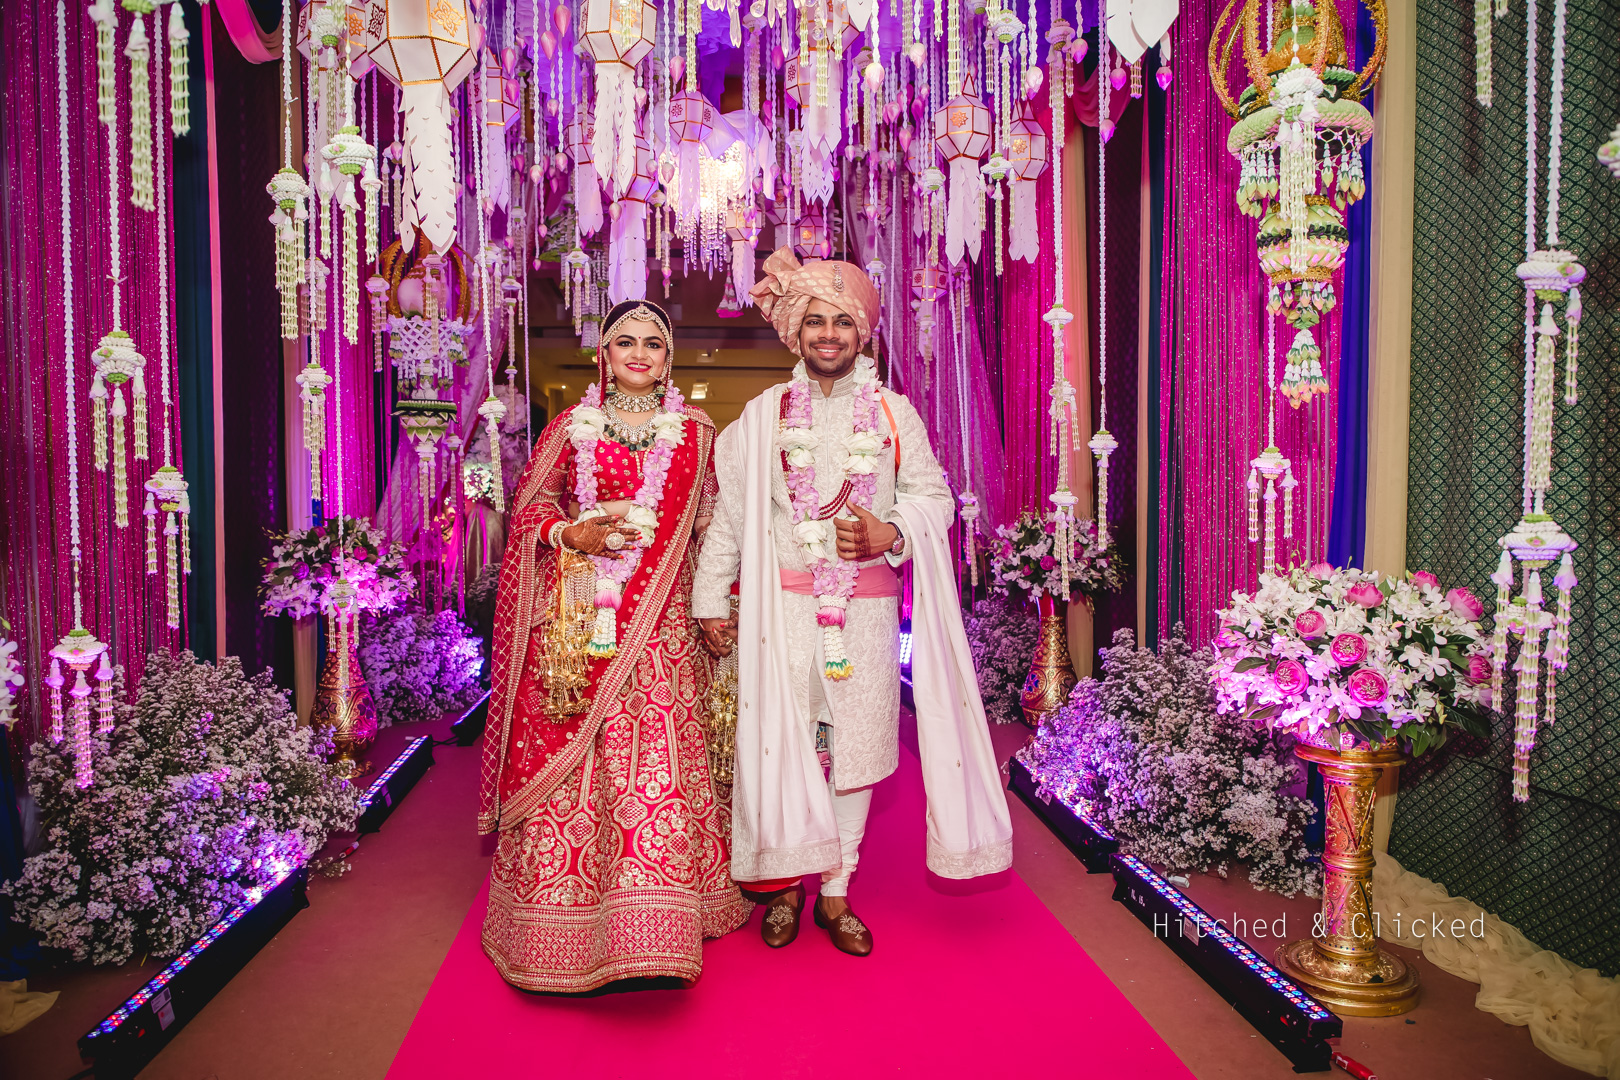 couple entry at thailand destination wedding